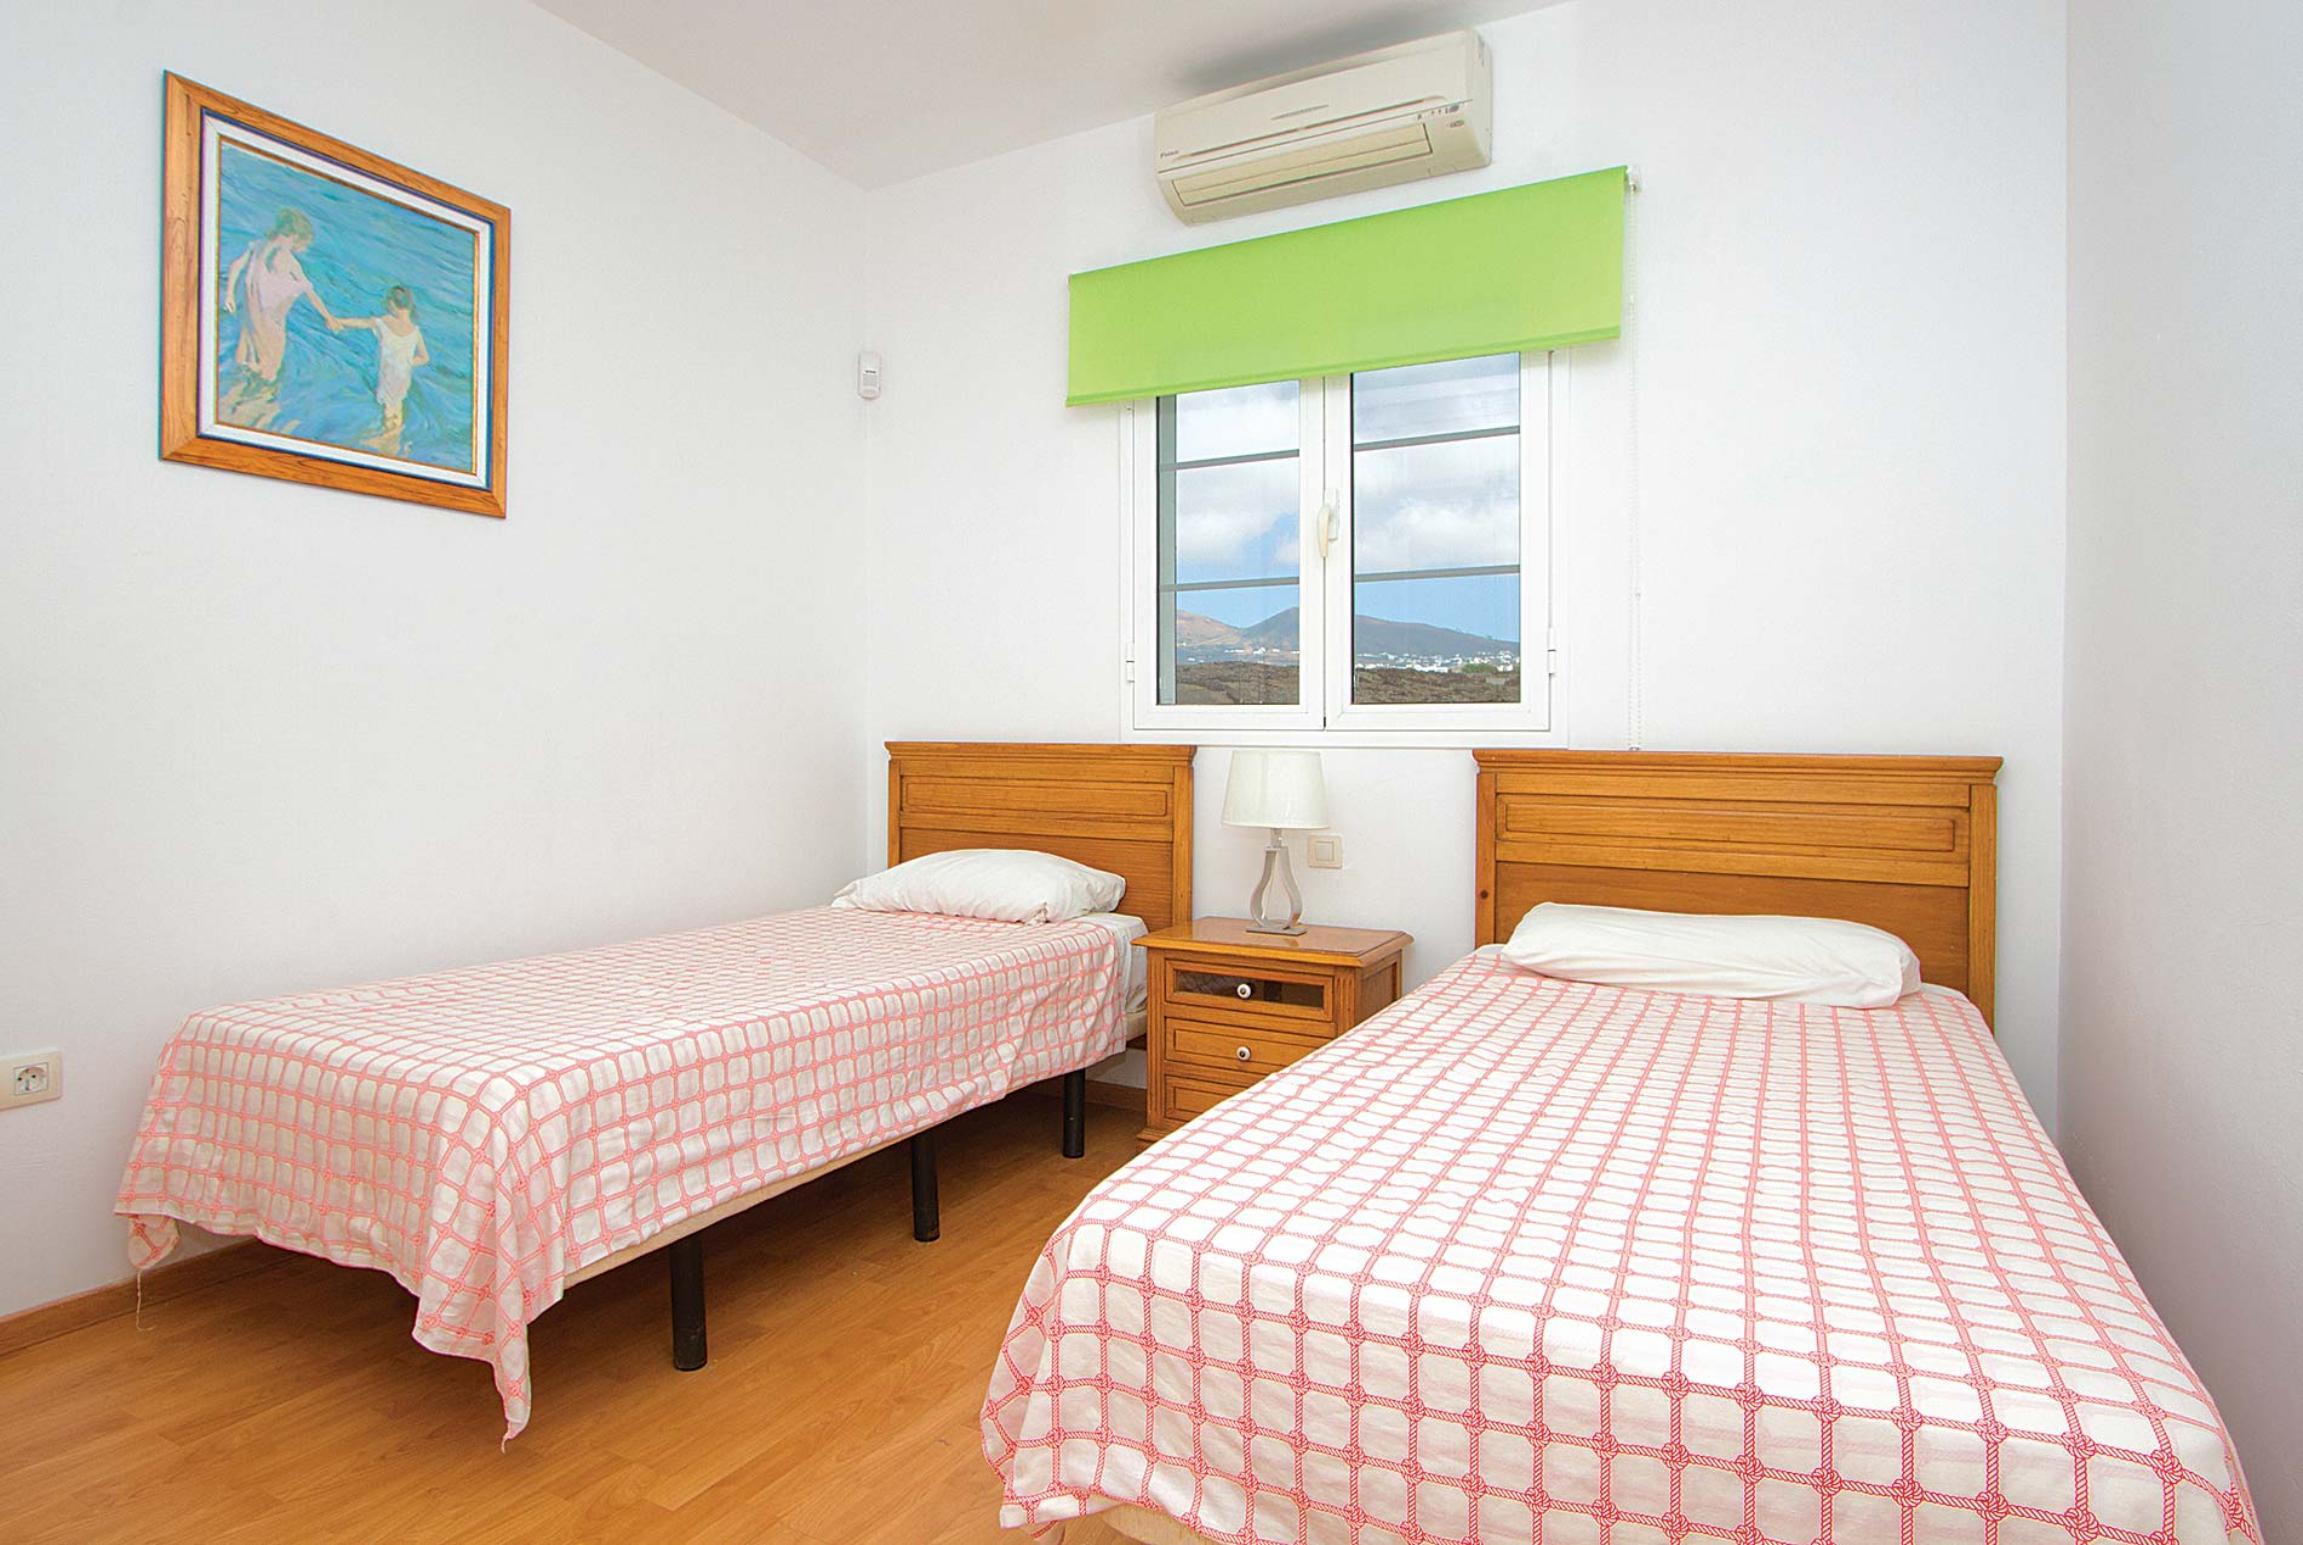 Ferienhaus Tania (2654356), Puerto del Carmen, Lanzarote, Kanarische Inseln, Spanien, Bild 8